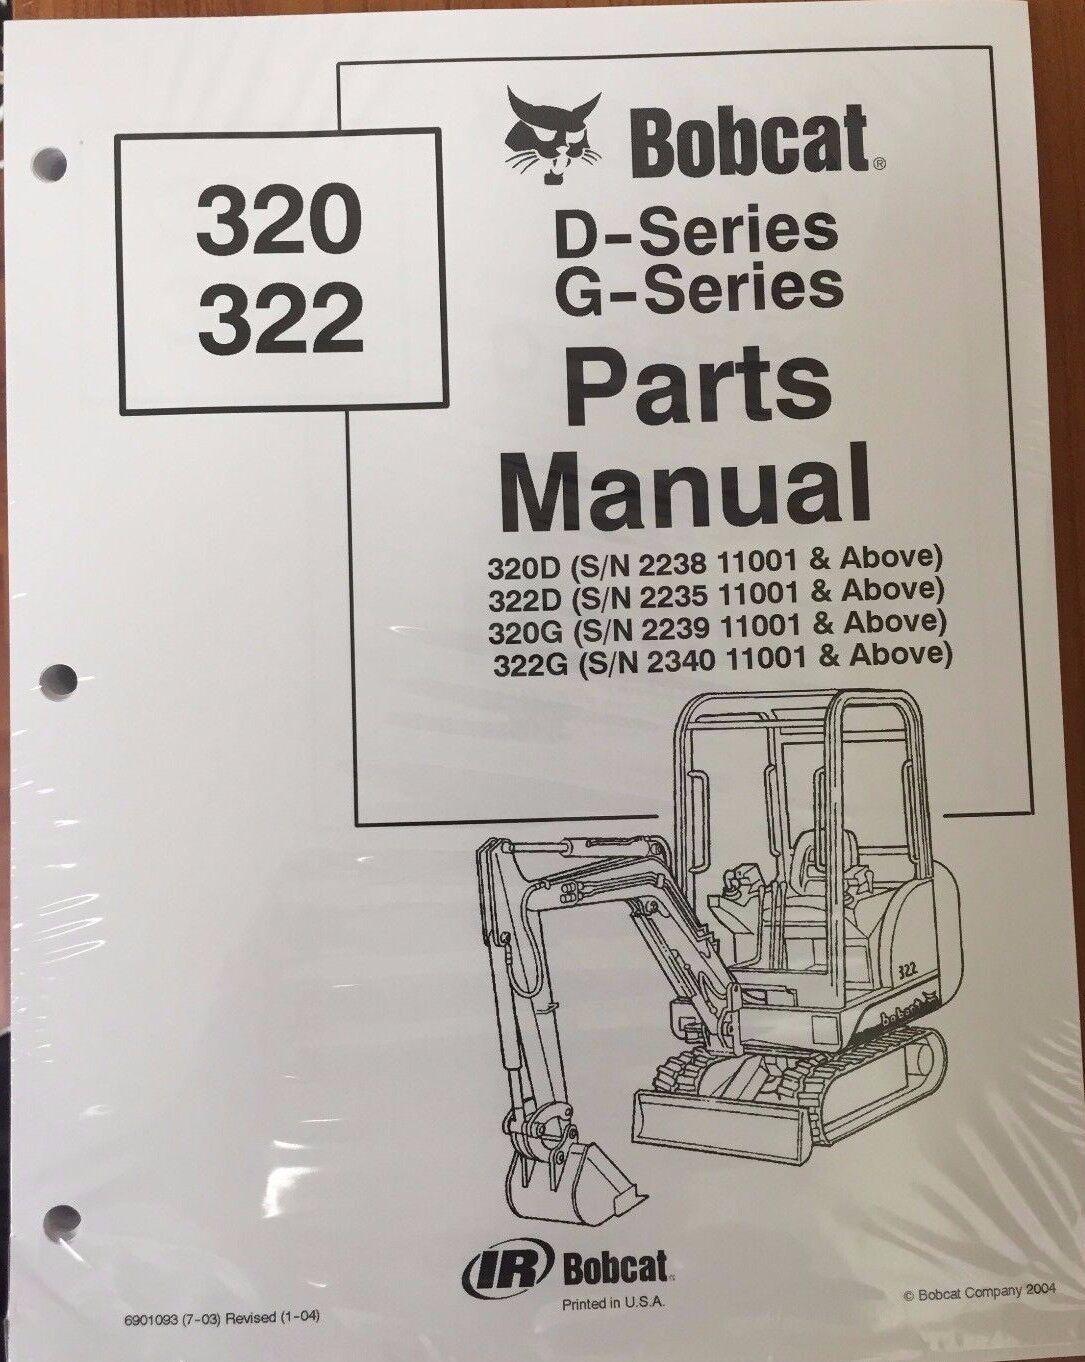 Bobcat 320 322 D G Series Parts Catalog Manual - Part Number # 6901093